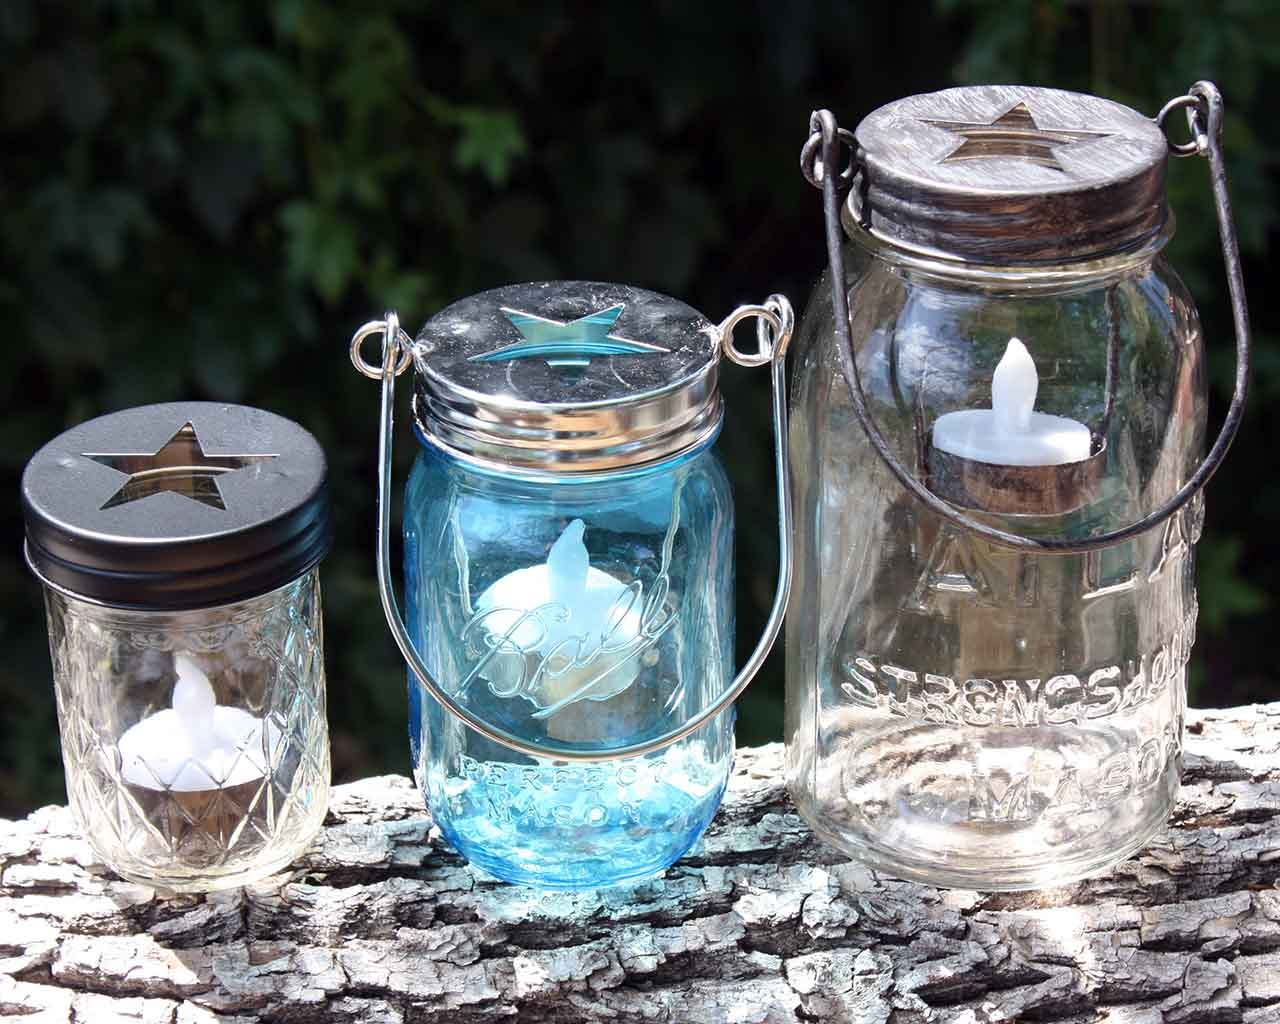 Amazon.com: Star Cutout Tea Light Candle Holder Lids for Regular ...